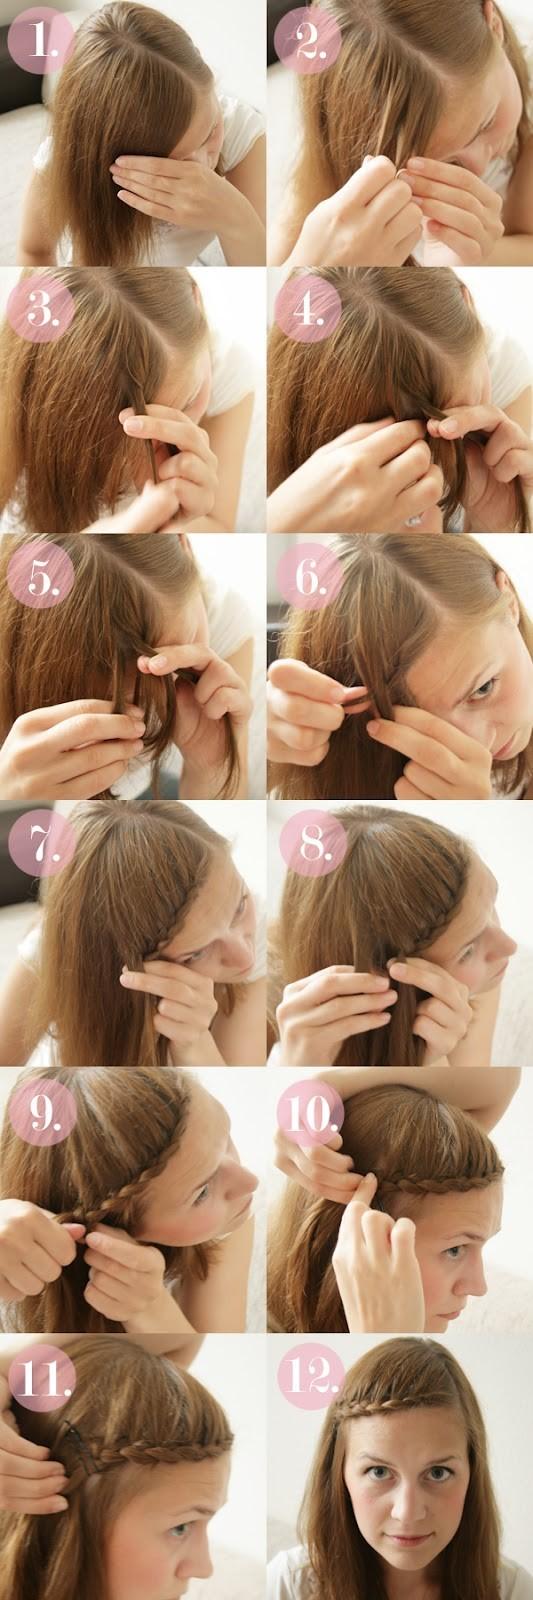 Pleasant 15 Braided Bangs Tutorials Cute Easy Hairstyles Pretty Designs Hairstyles For Men Maxibearus